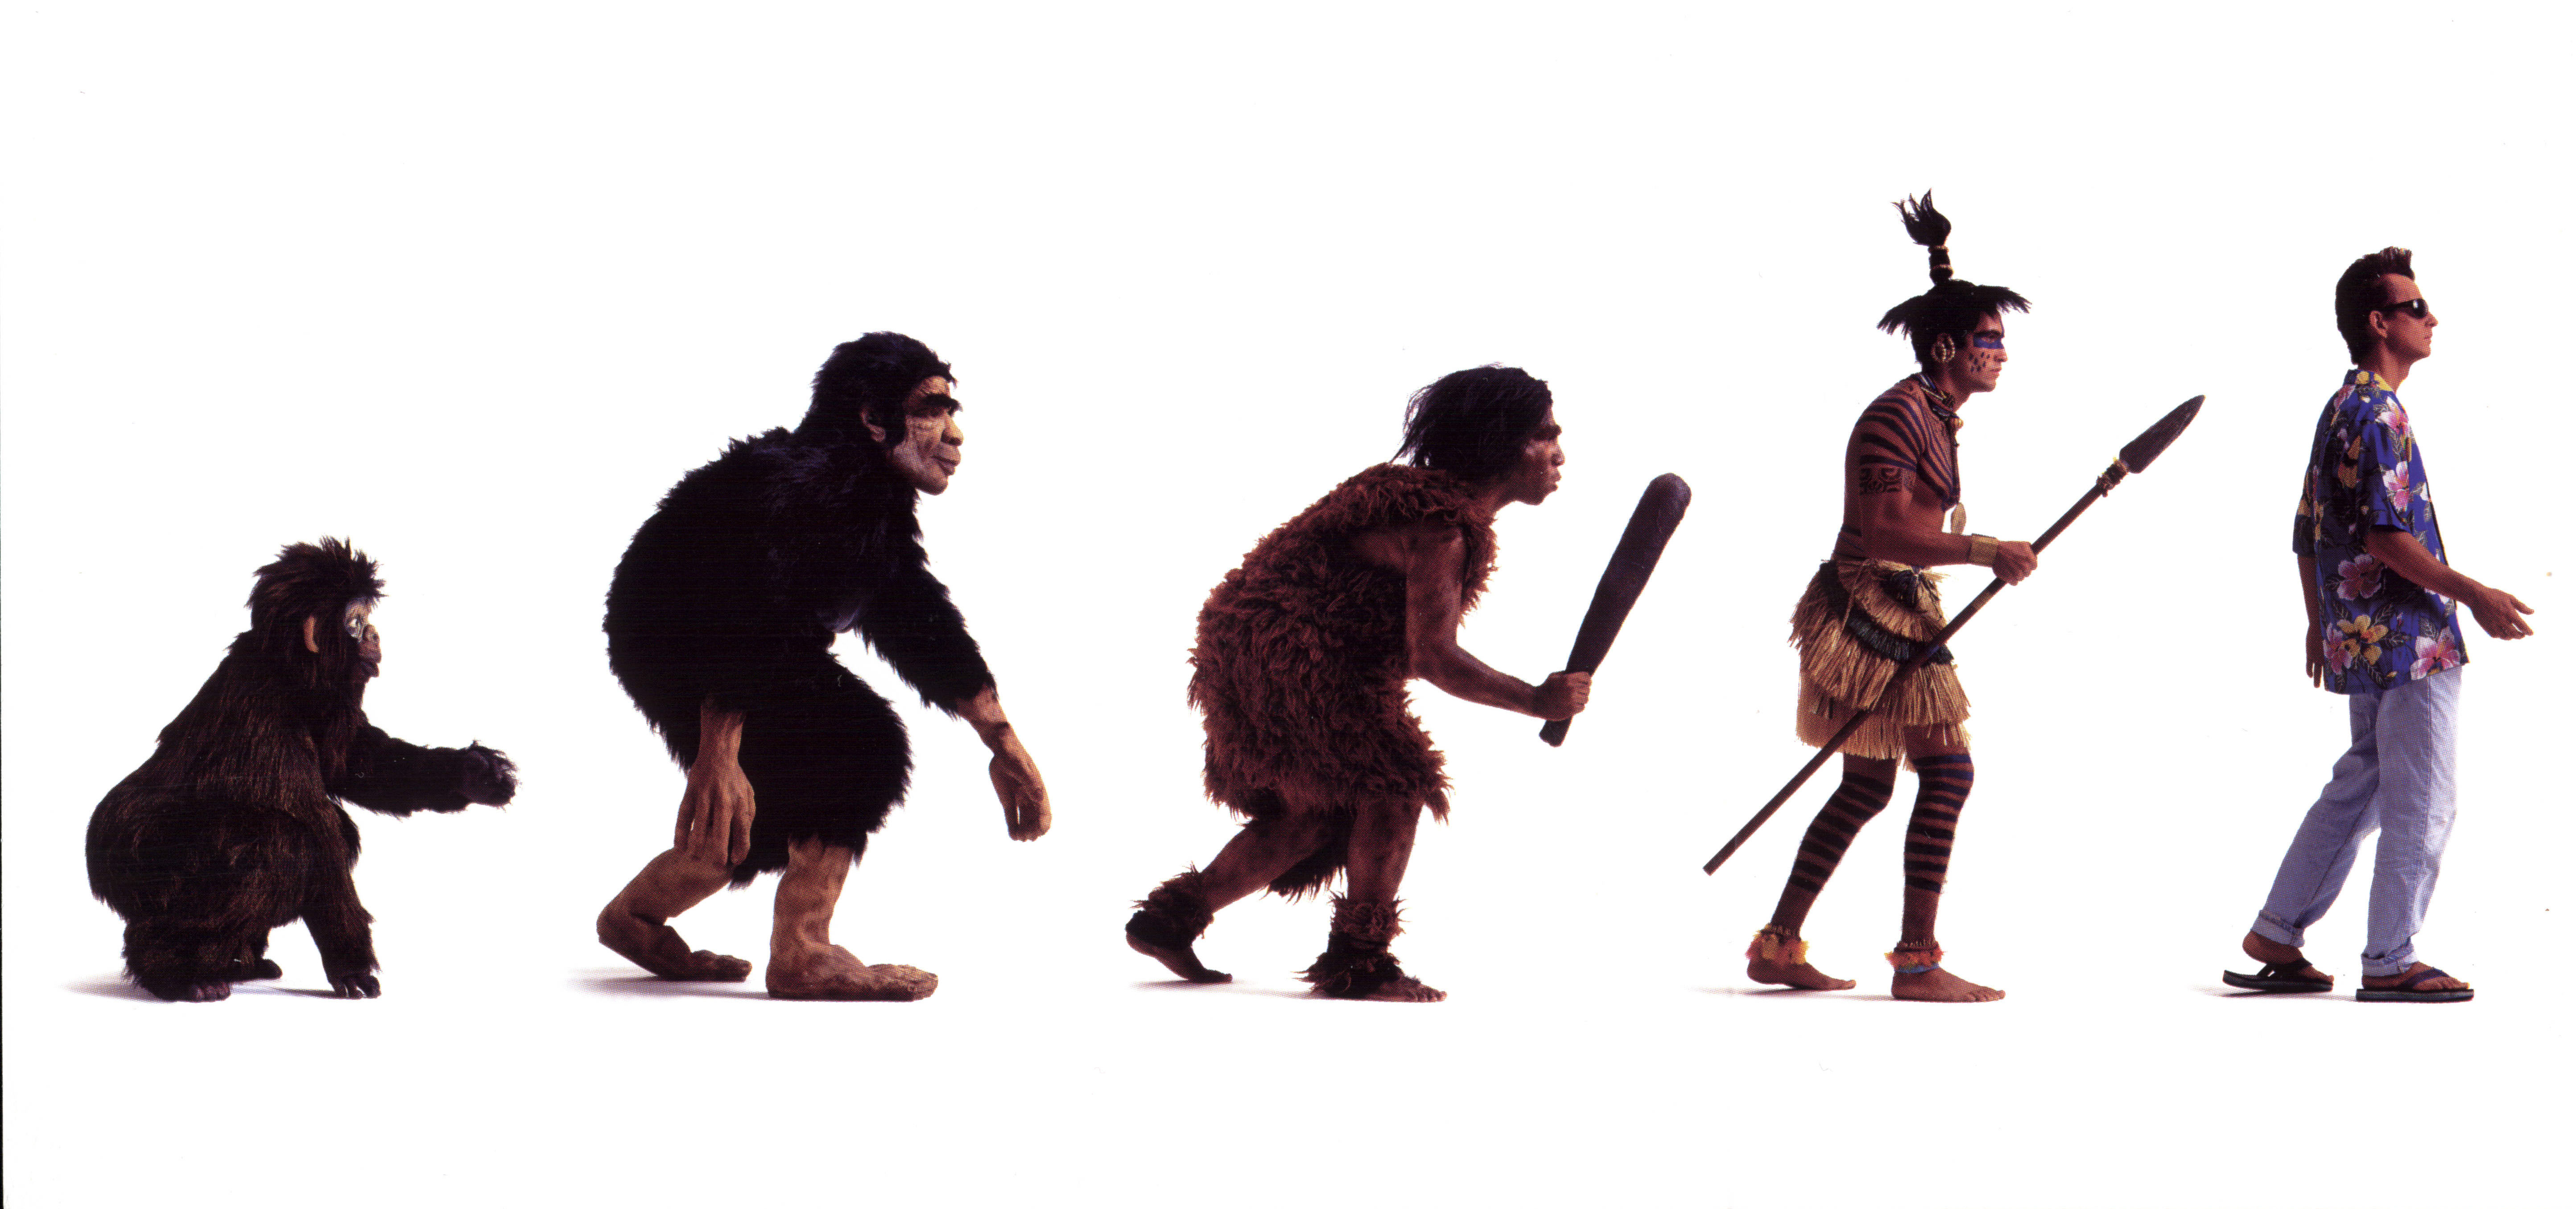 evolution in islam